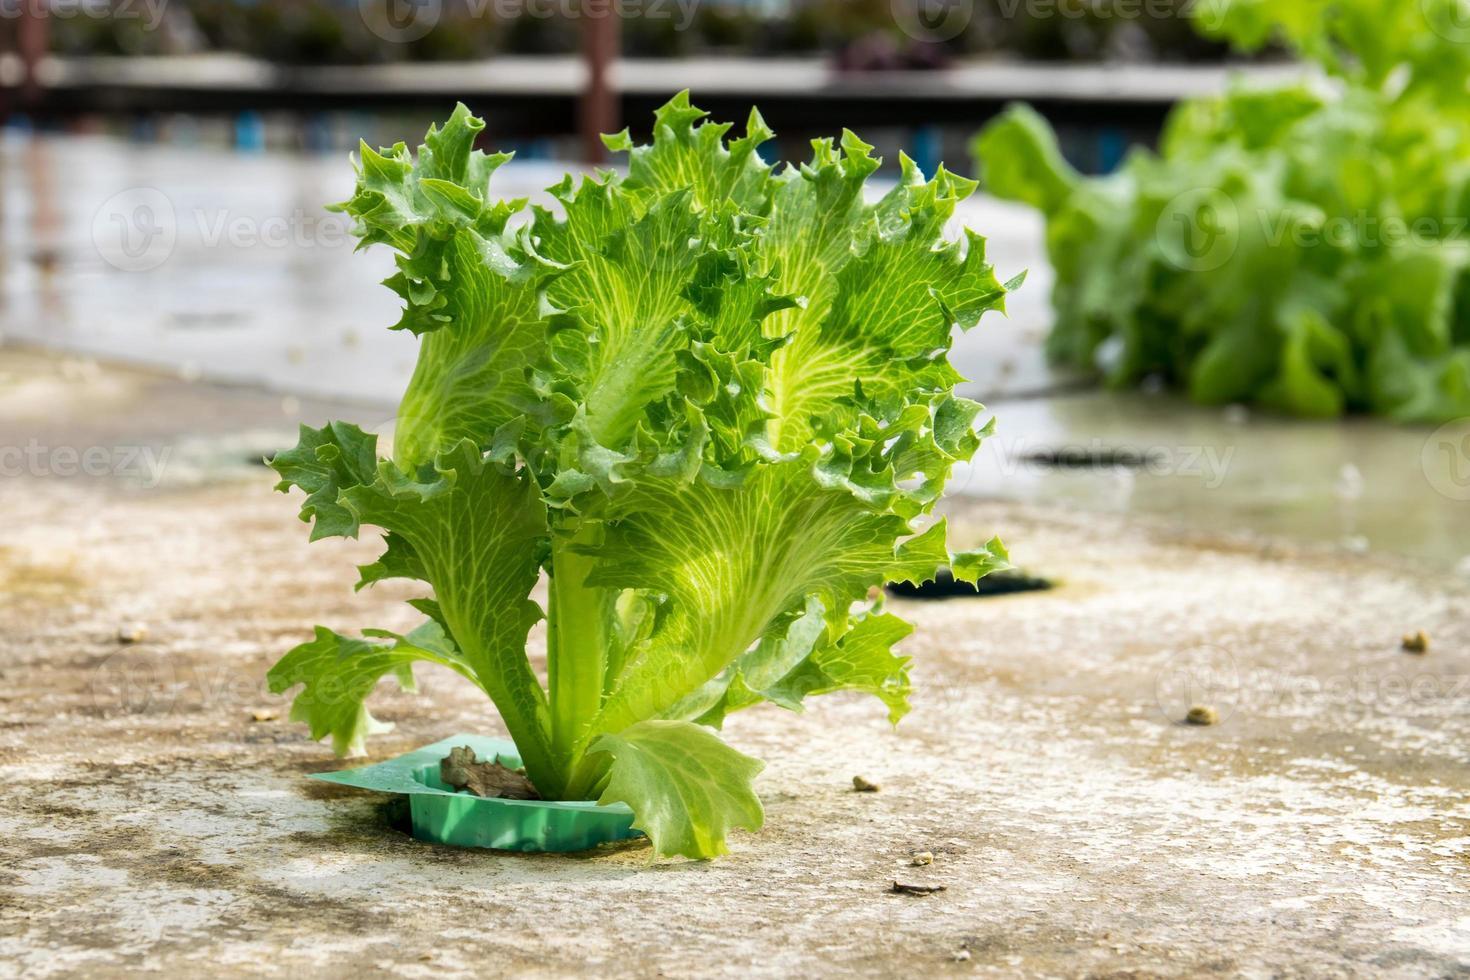 hidroponia de cultivo verde vegetal na fazenda foto